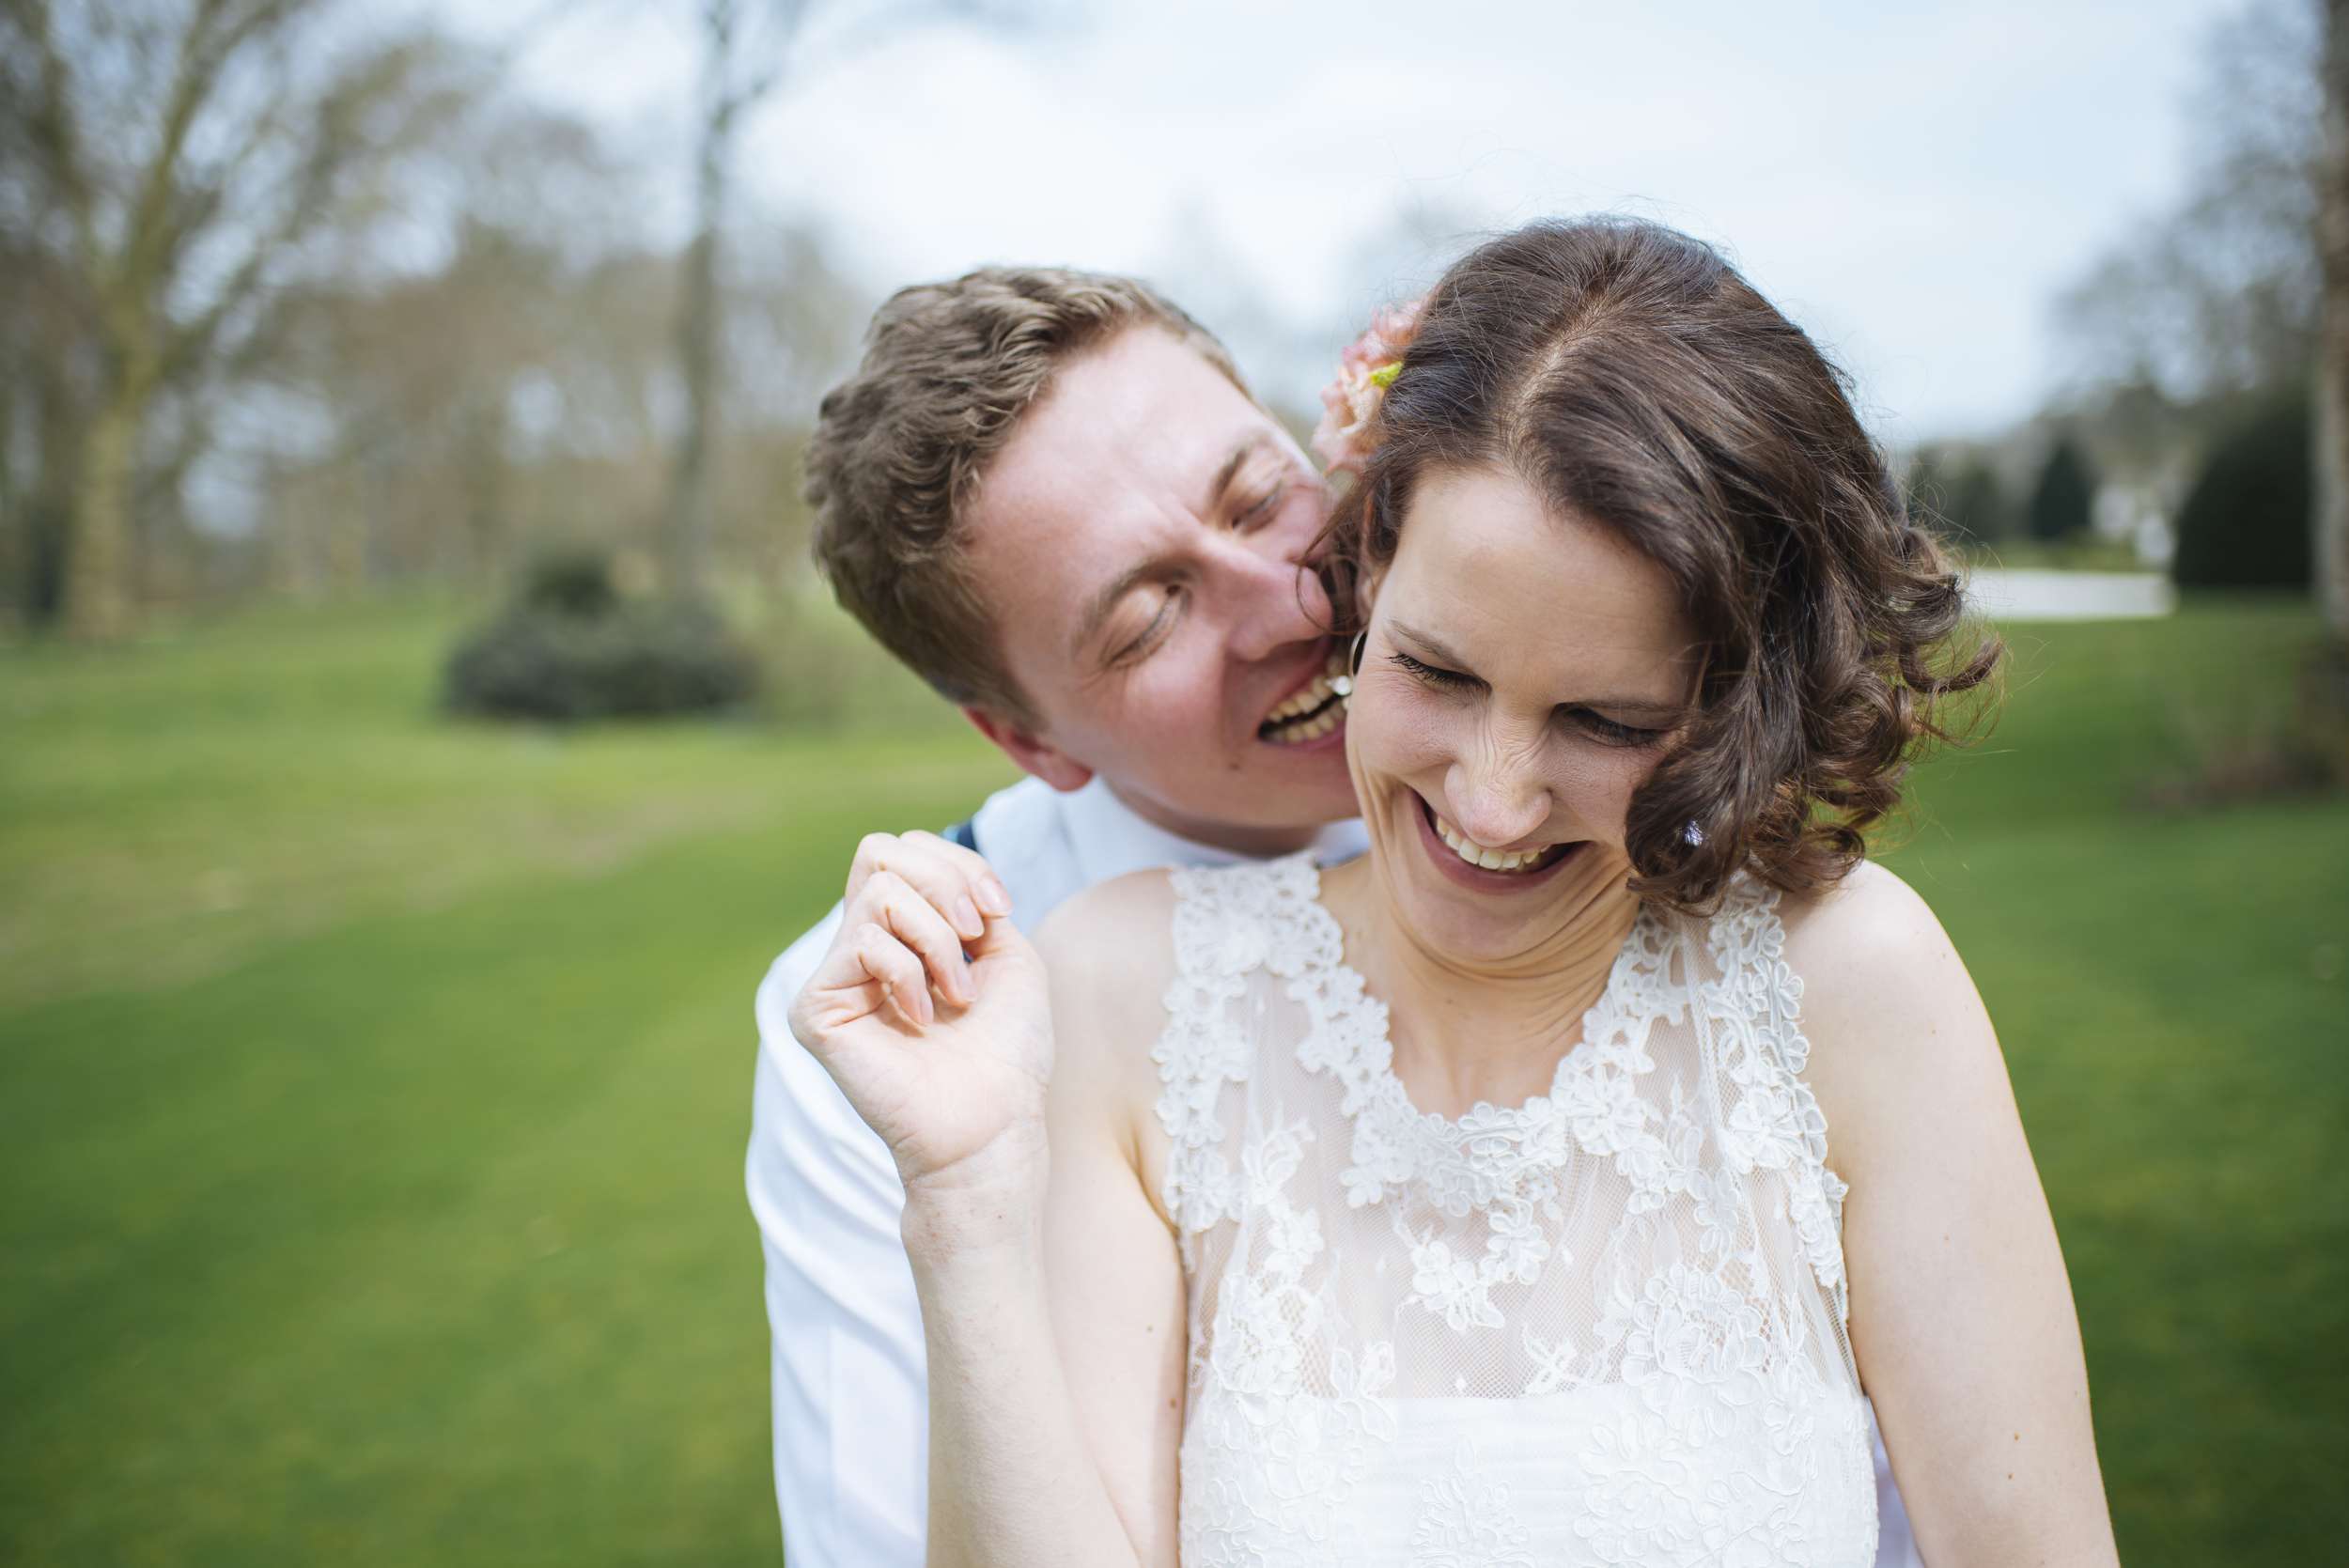 Hochzeitsfotograf-Schlossruine-Hertefeld-Weeze-025.jpg